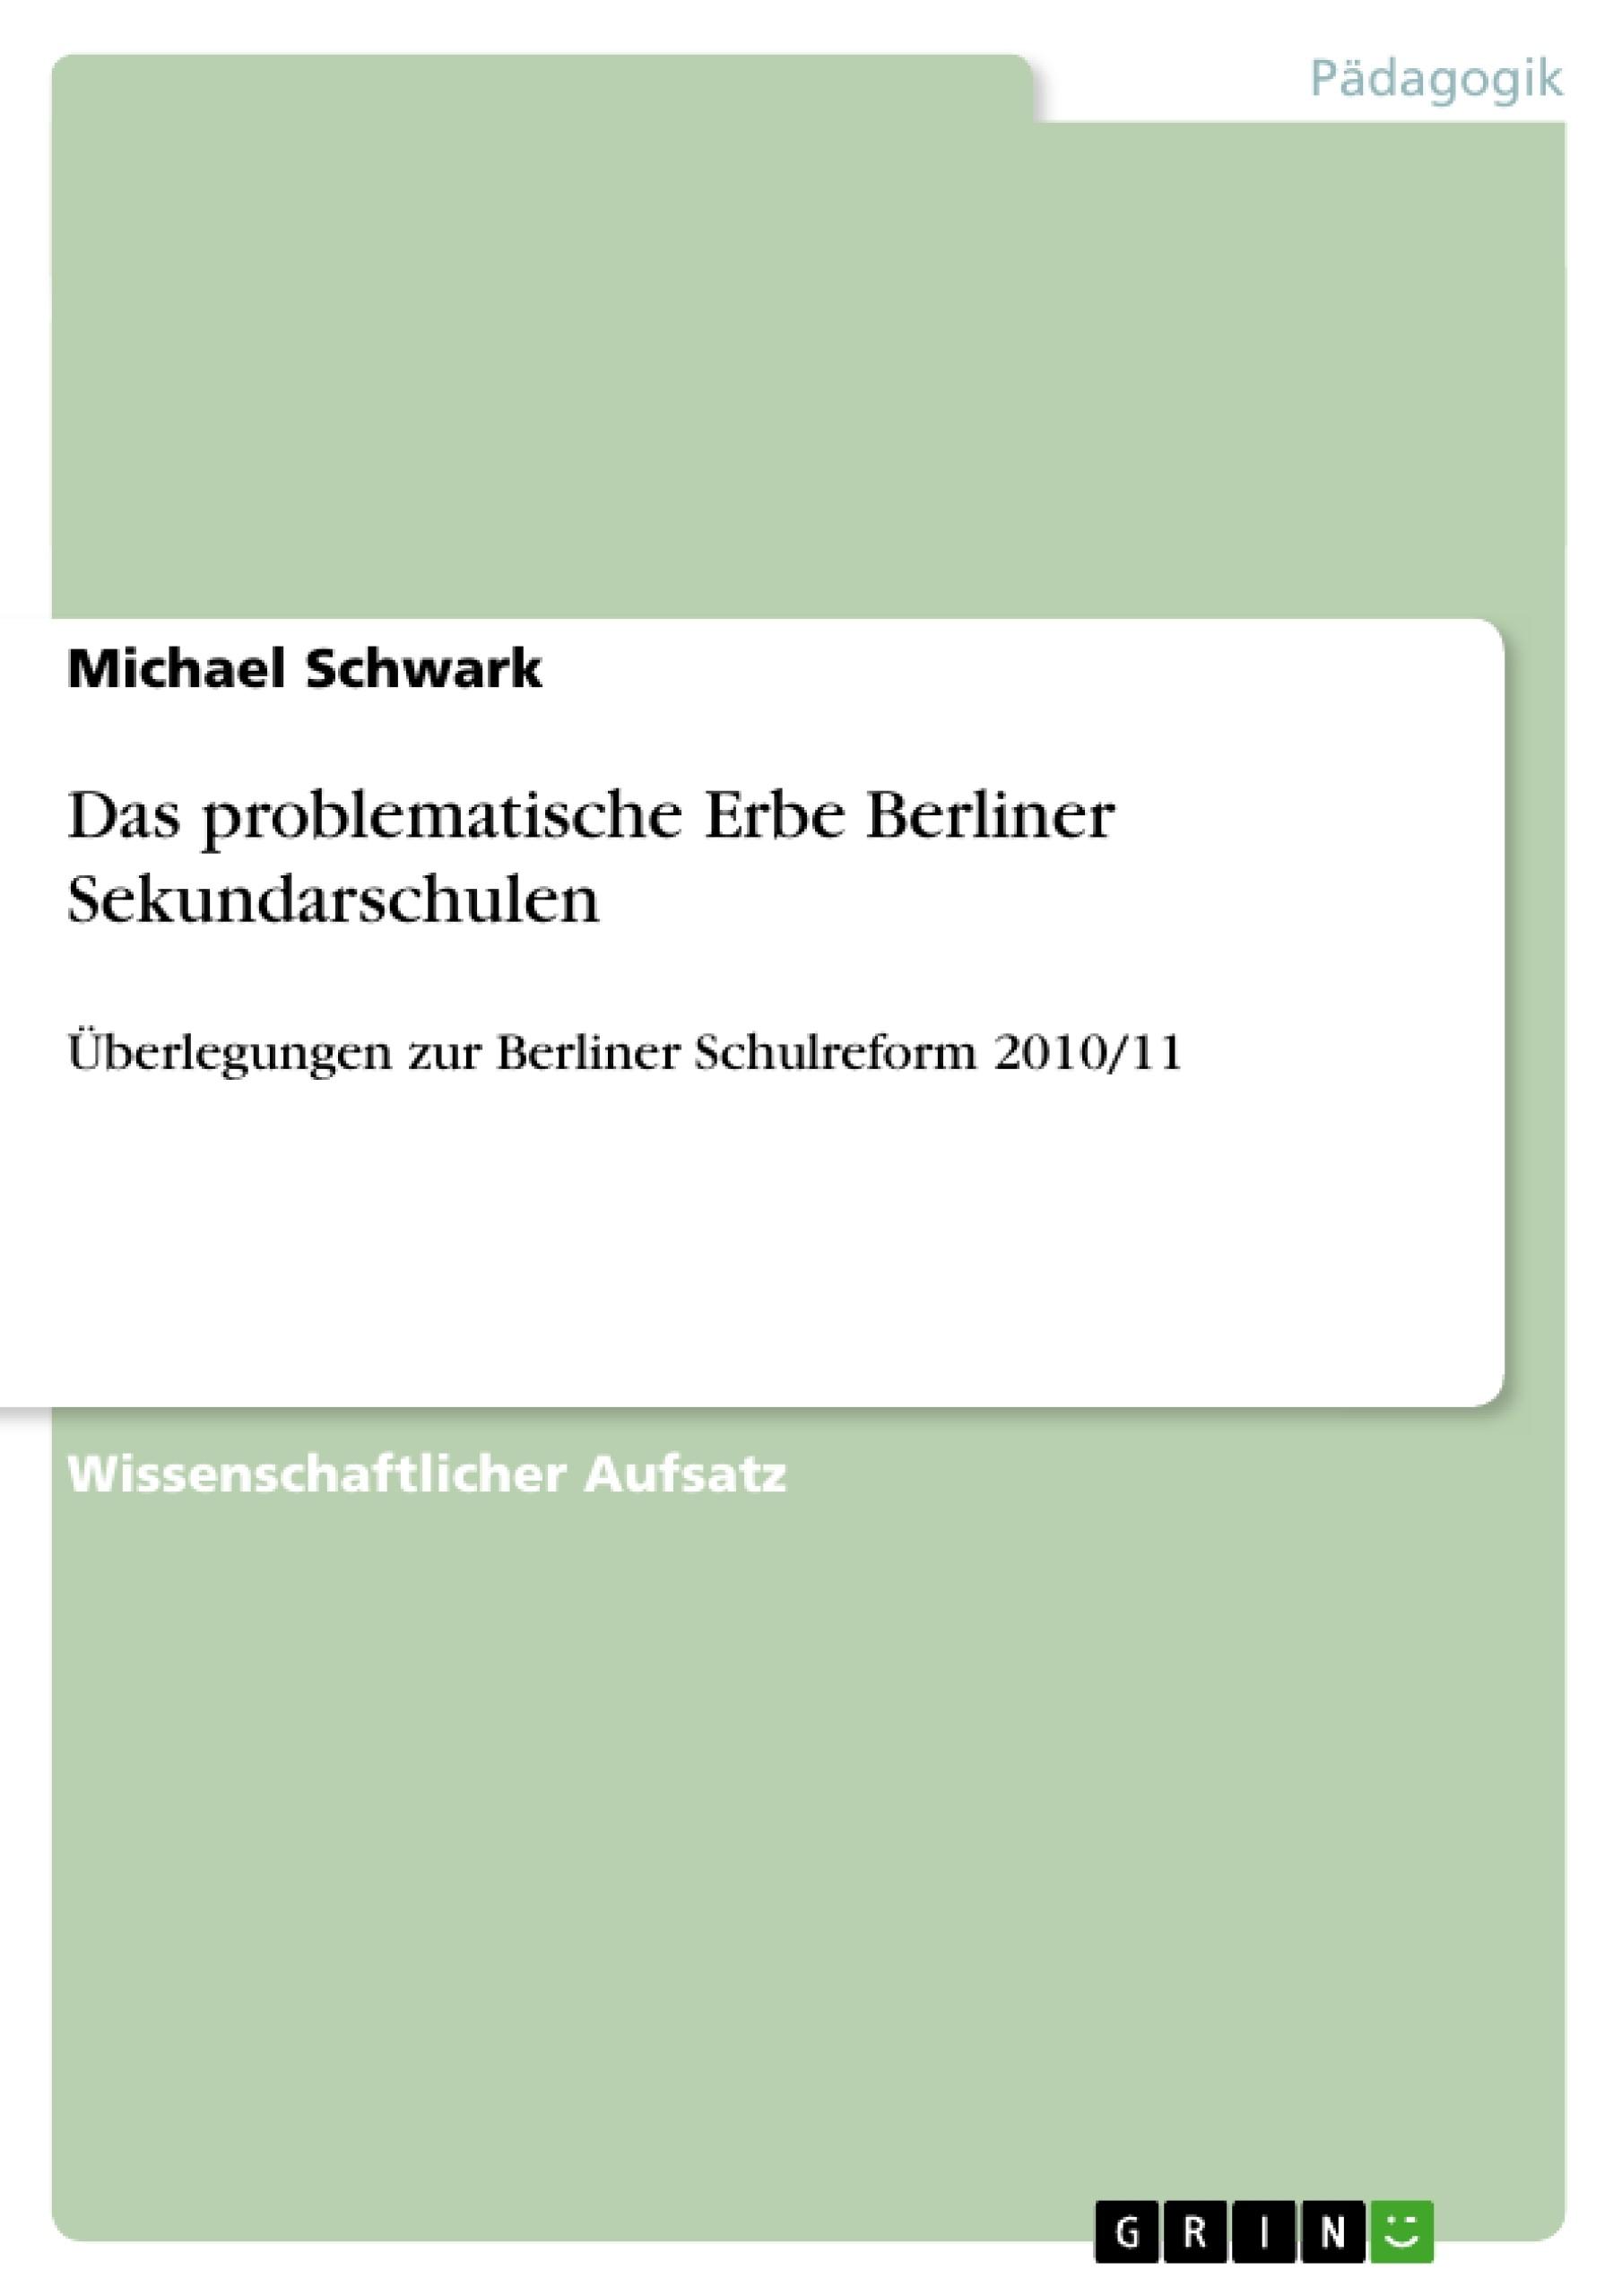 Titel: Das problematische Erbe Berliner Sekundarschulen